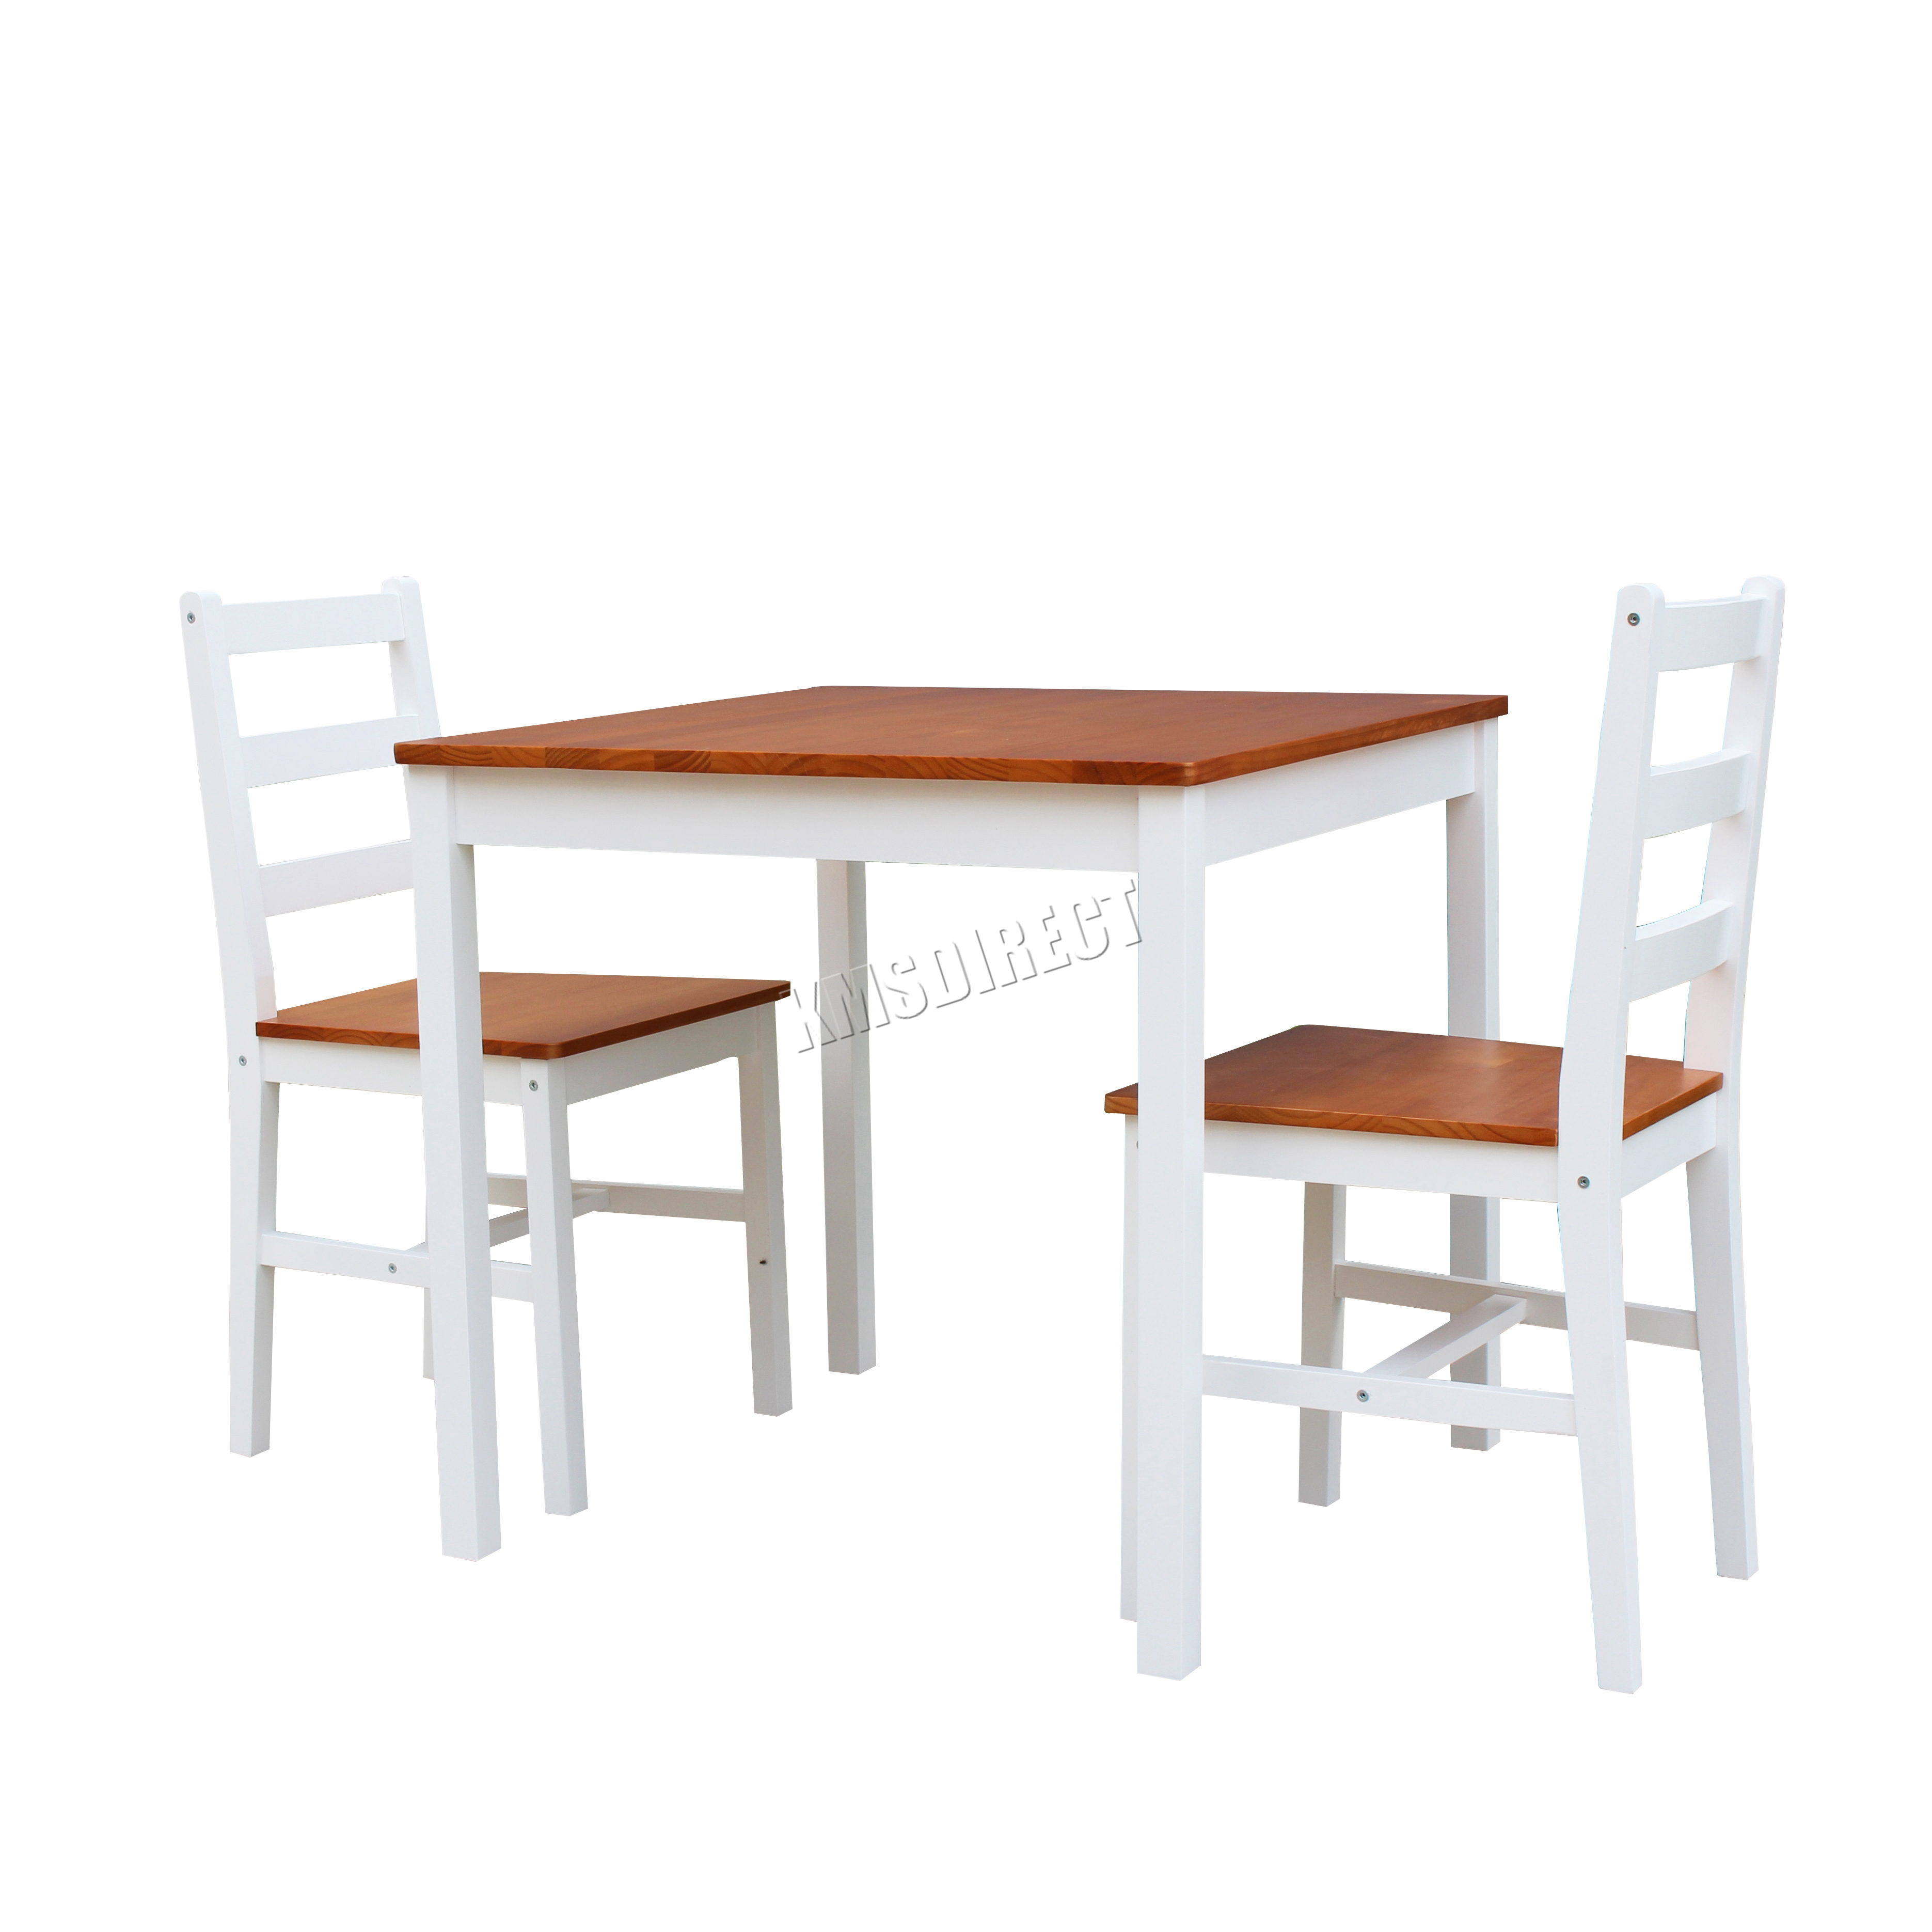 Pine wood dining